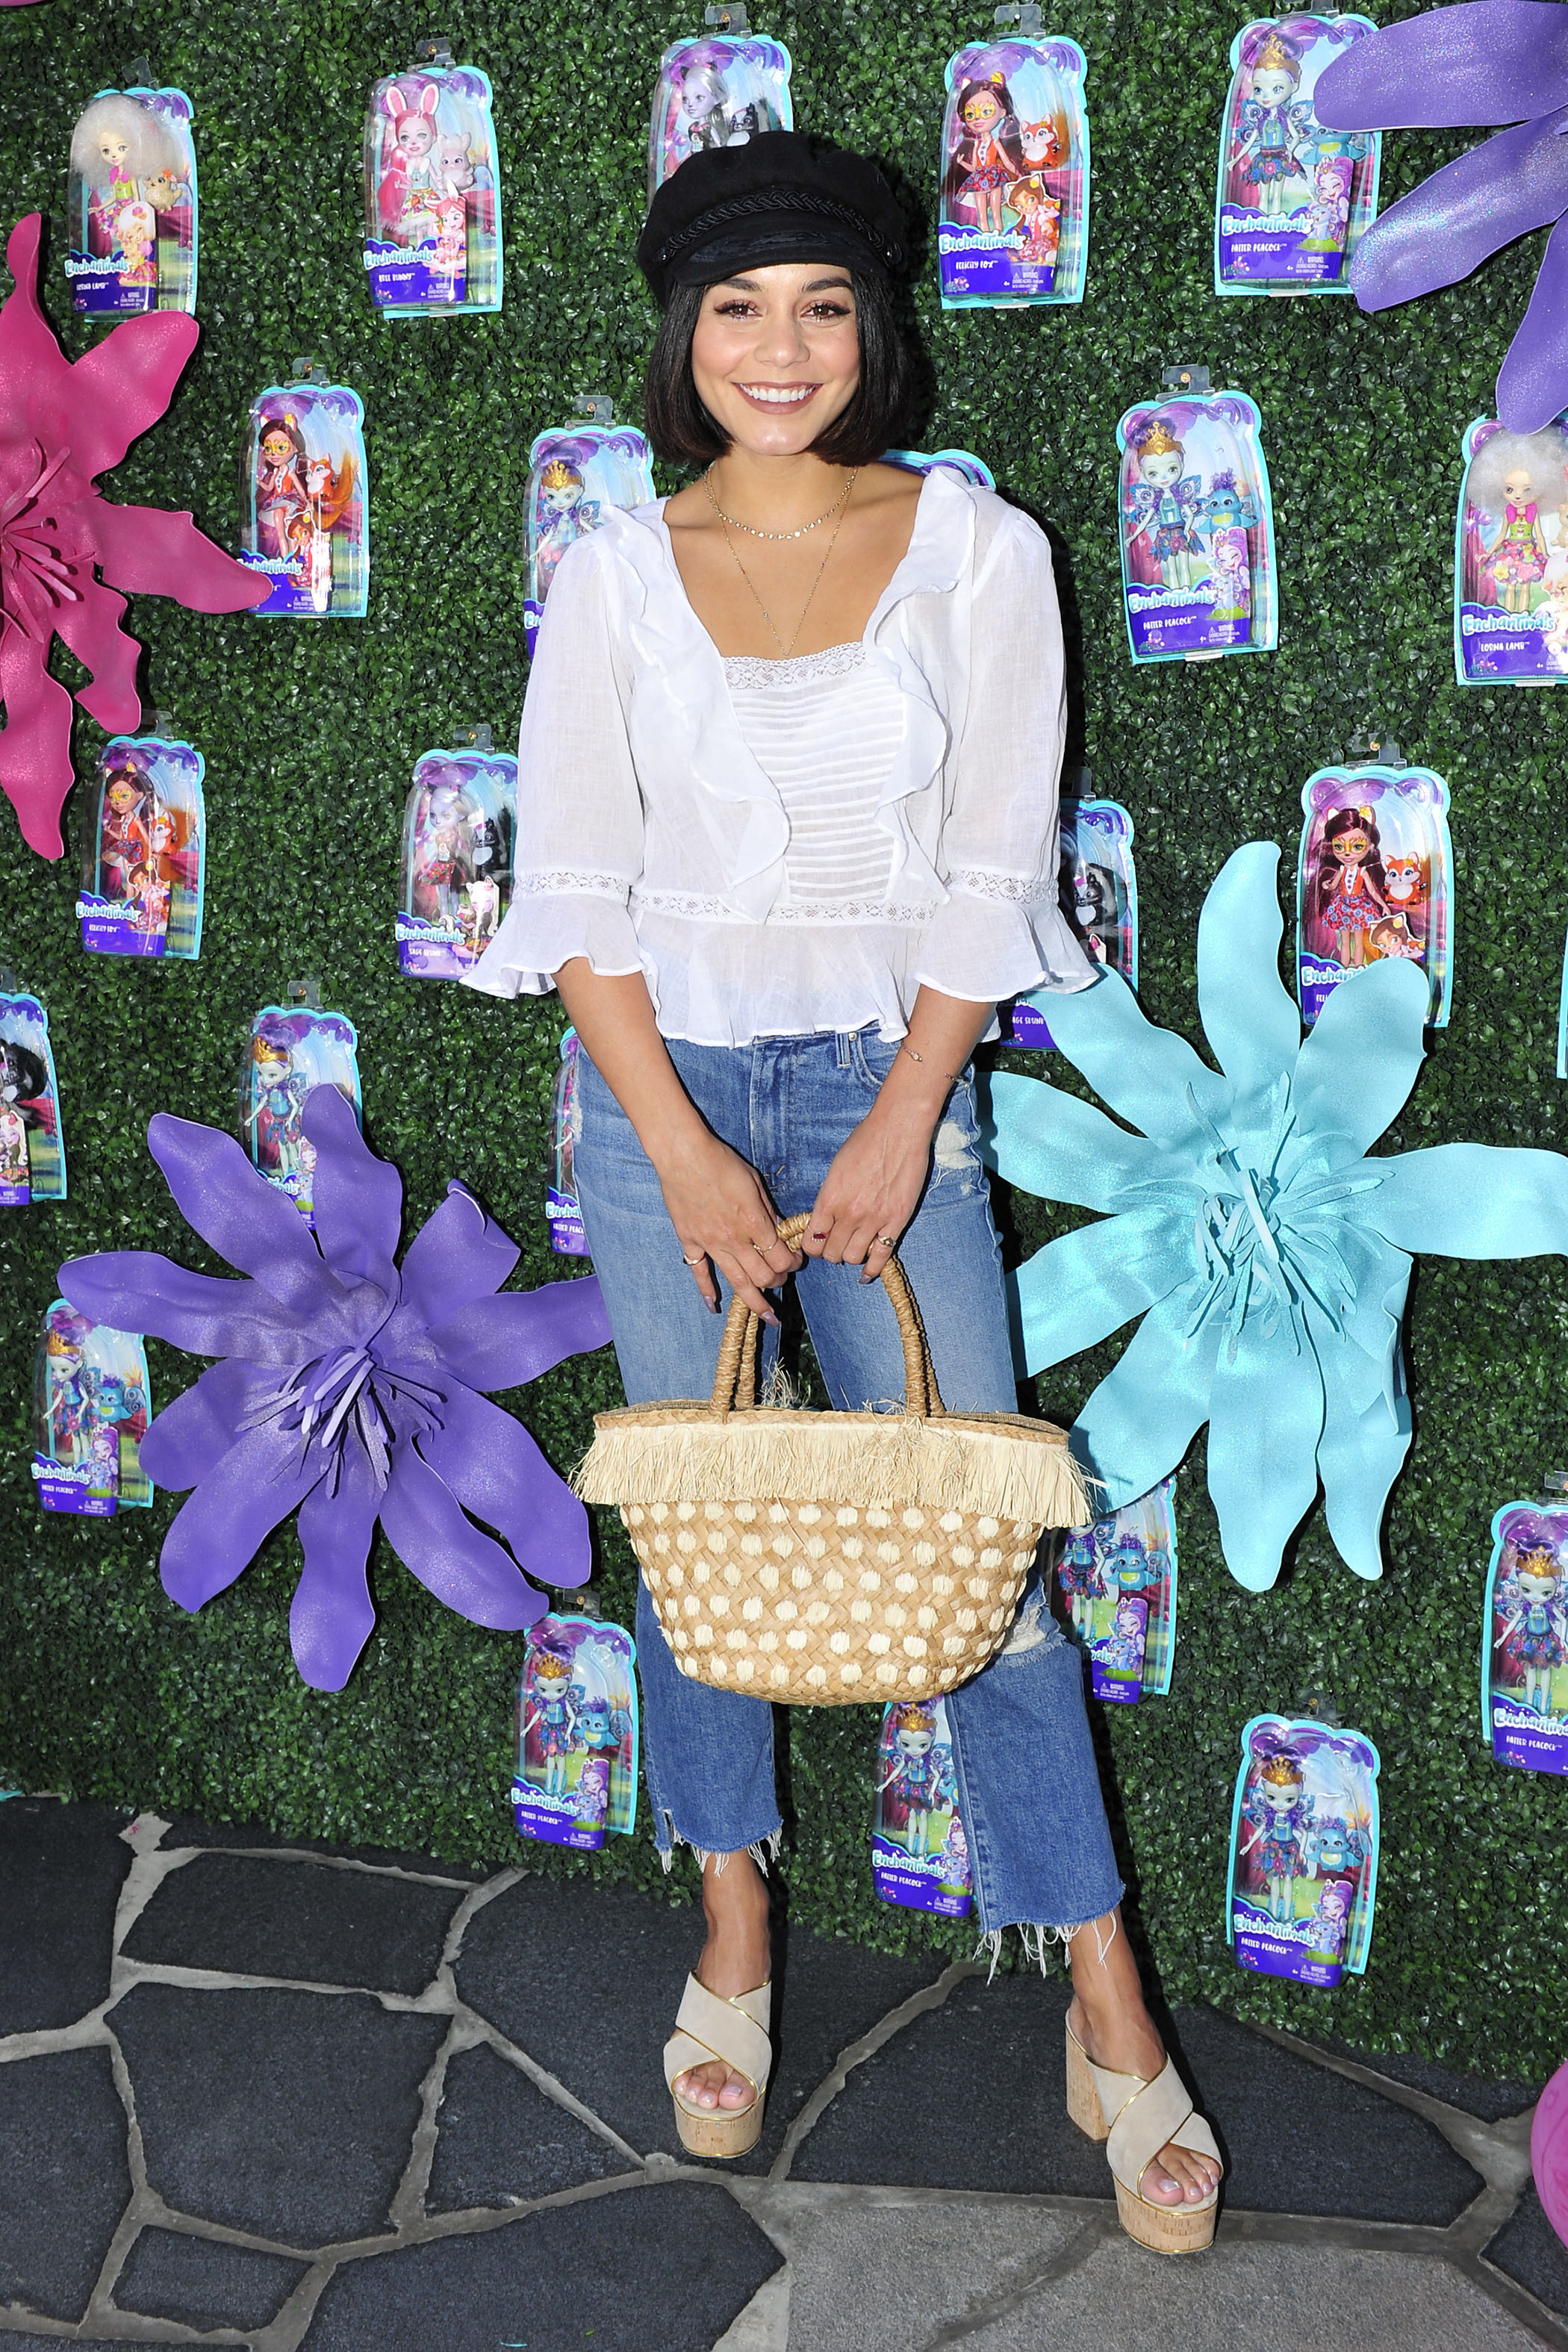 Vanessa Hudgens attends the Enchantimals party at Santa Monica Place in Santa Monica, Calif., in July 18, 2017.